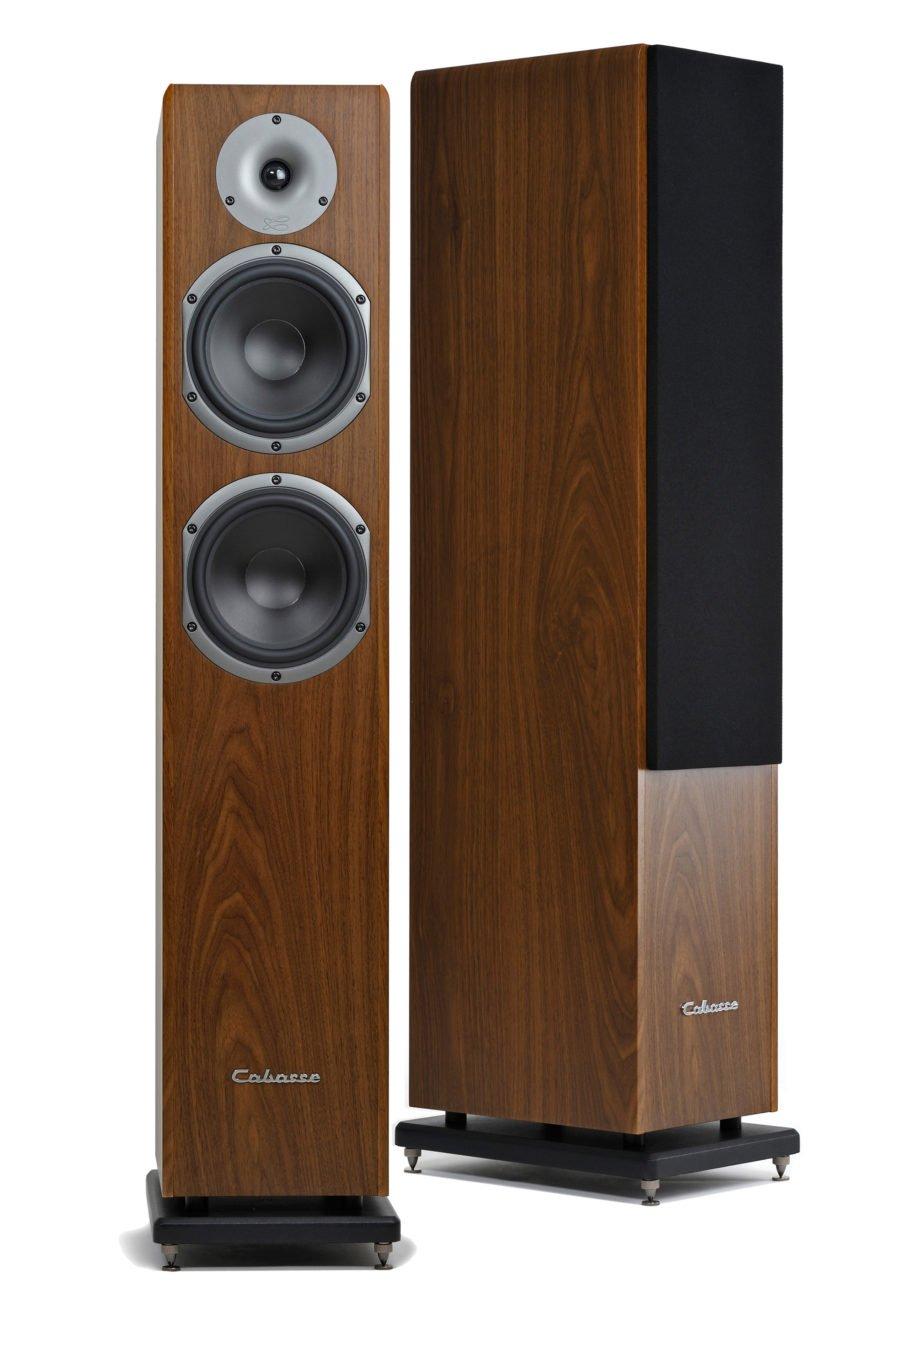 Cabasse Introduce MT32 Range Of Loudspeakers